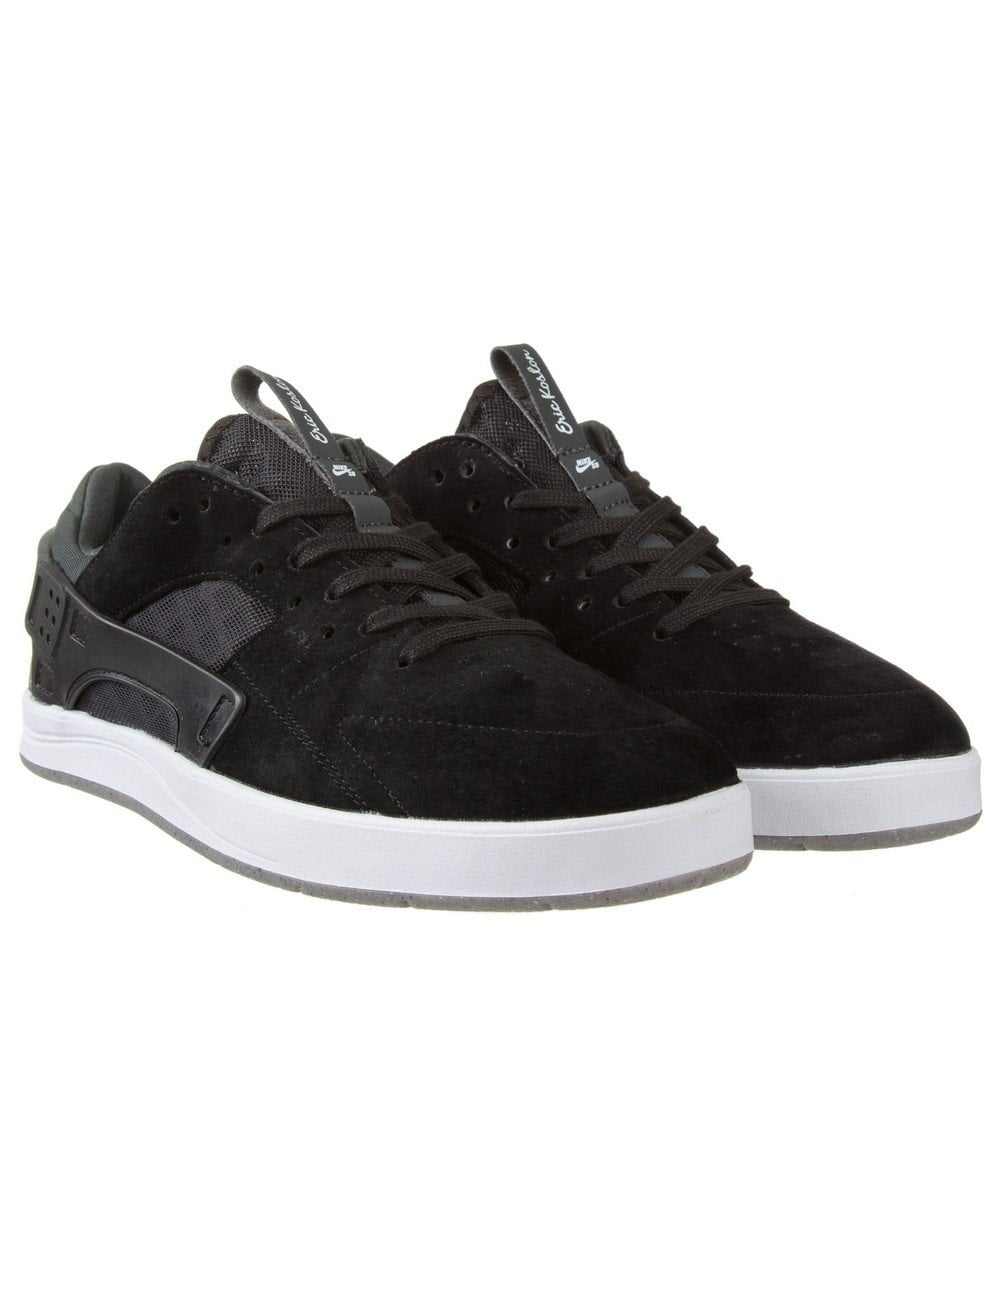 Pero Explícito chorro  Nike SB Eric Koston Huarache Shoes - Black/Anthracite - Footwear from Fat  Buddha Store UK